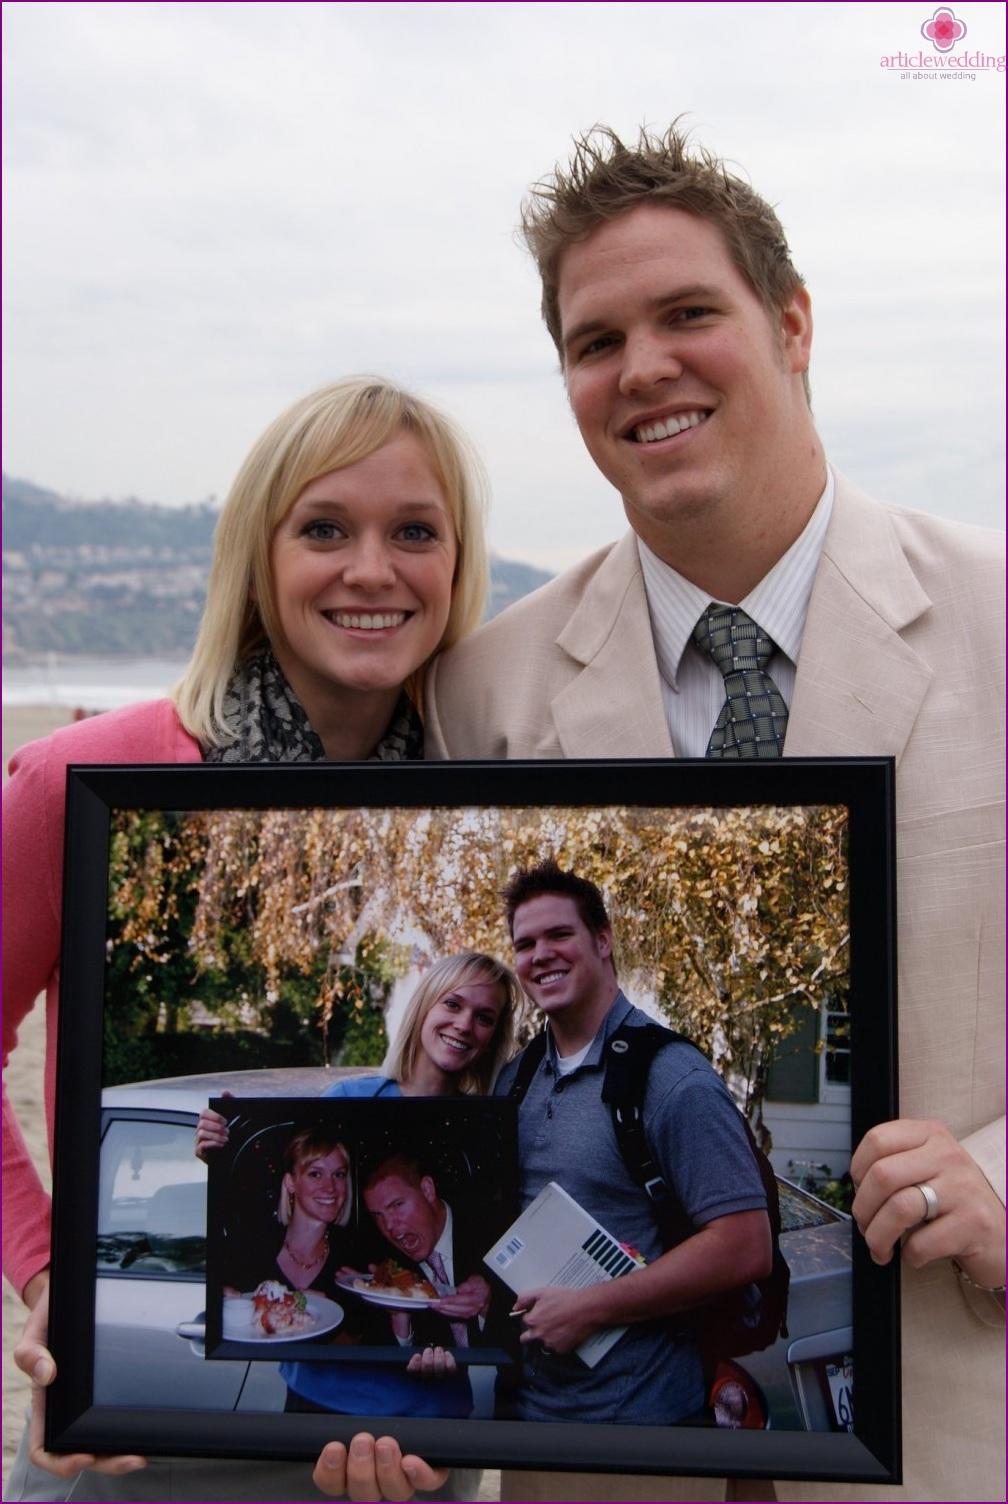 Wedding anniversary photo session with matryoshka photos